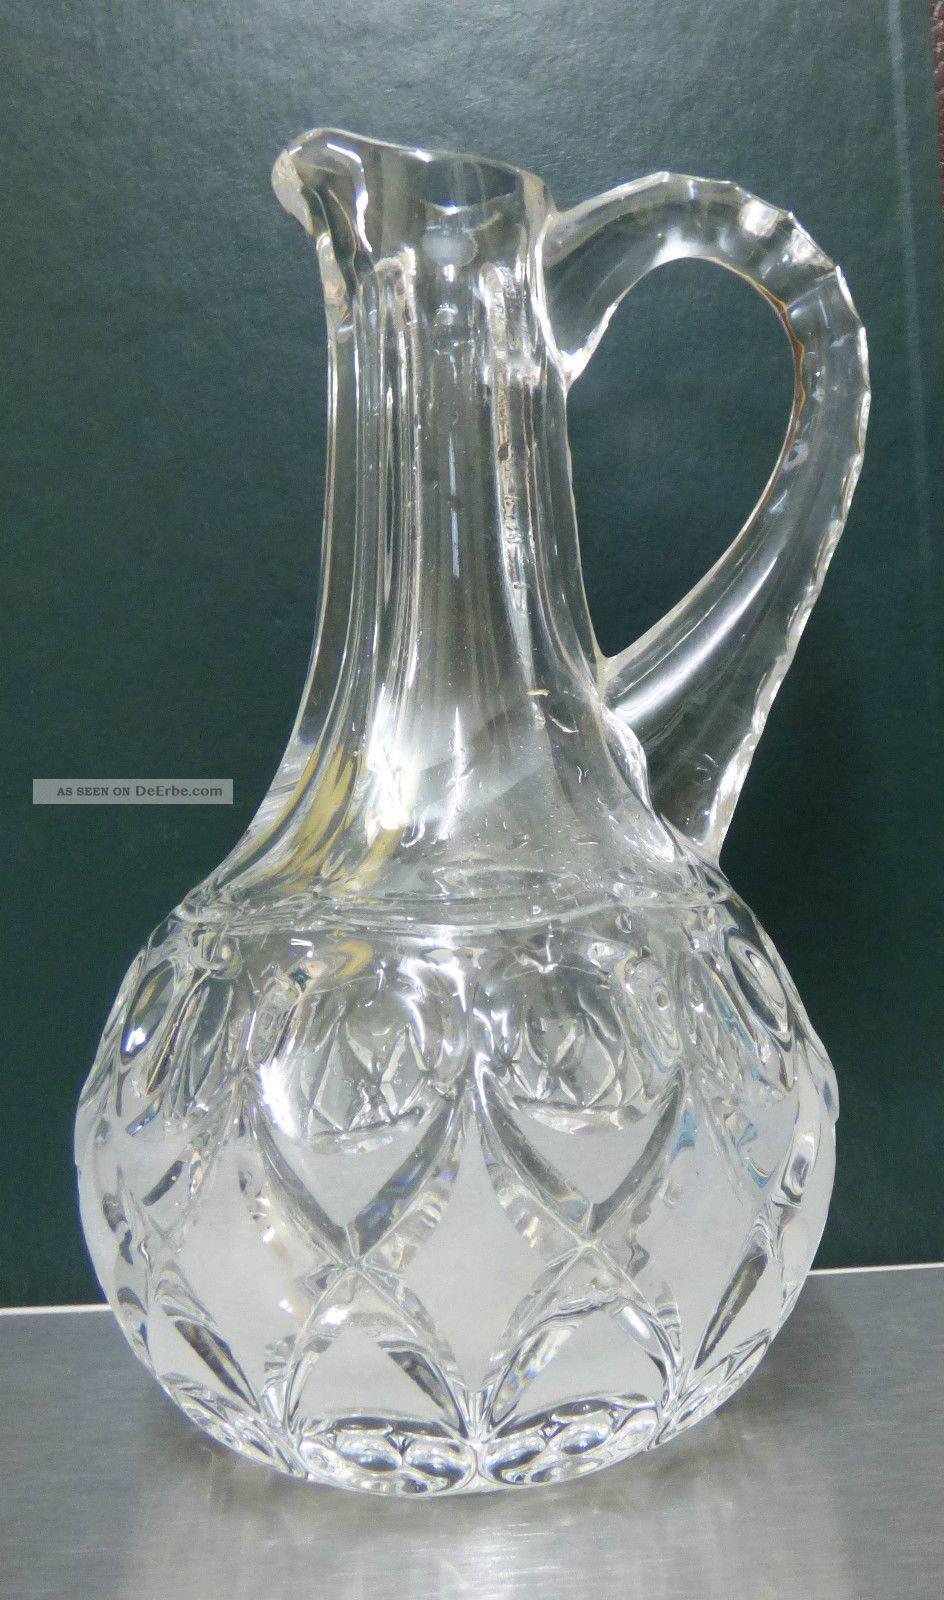 nachtmann kristallglas wundersch ne bleikristall karaffe krug vase. Black Bedroom Furniture Sets. Home Design Ideas